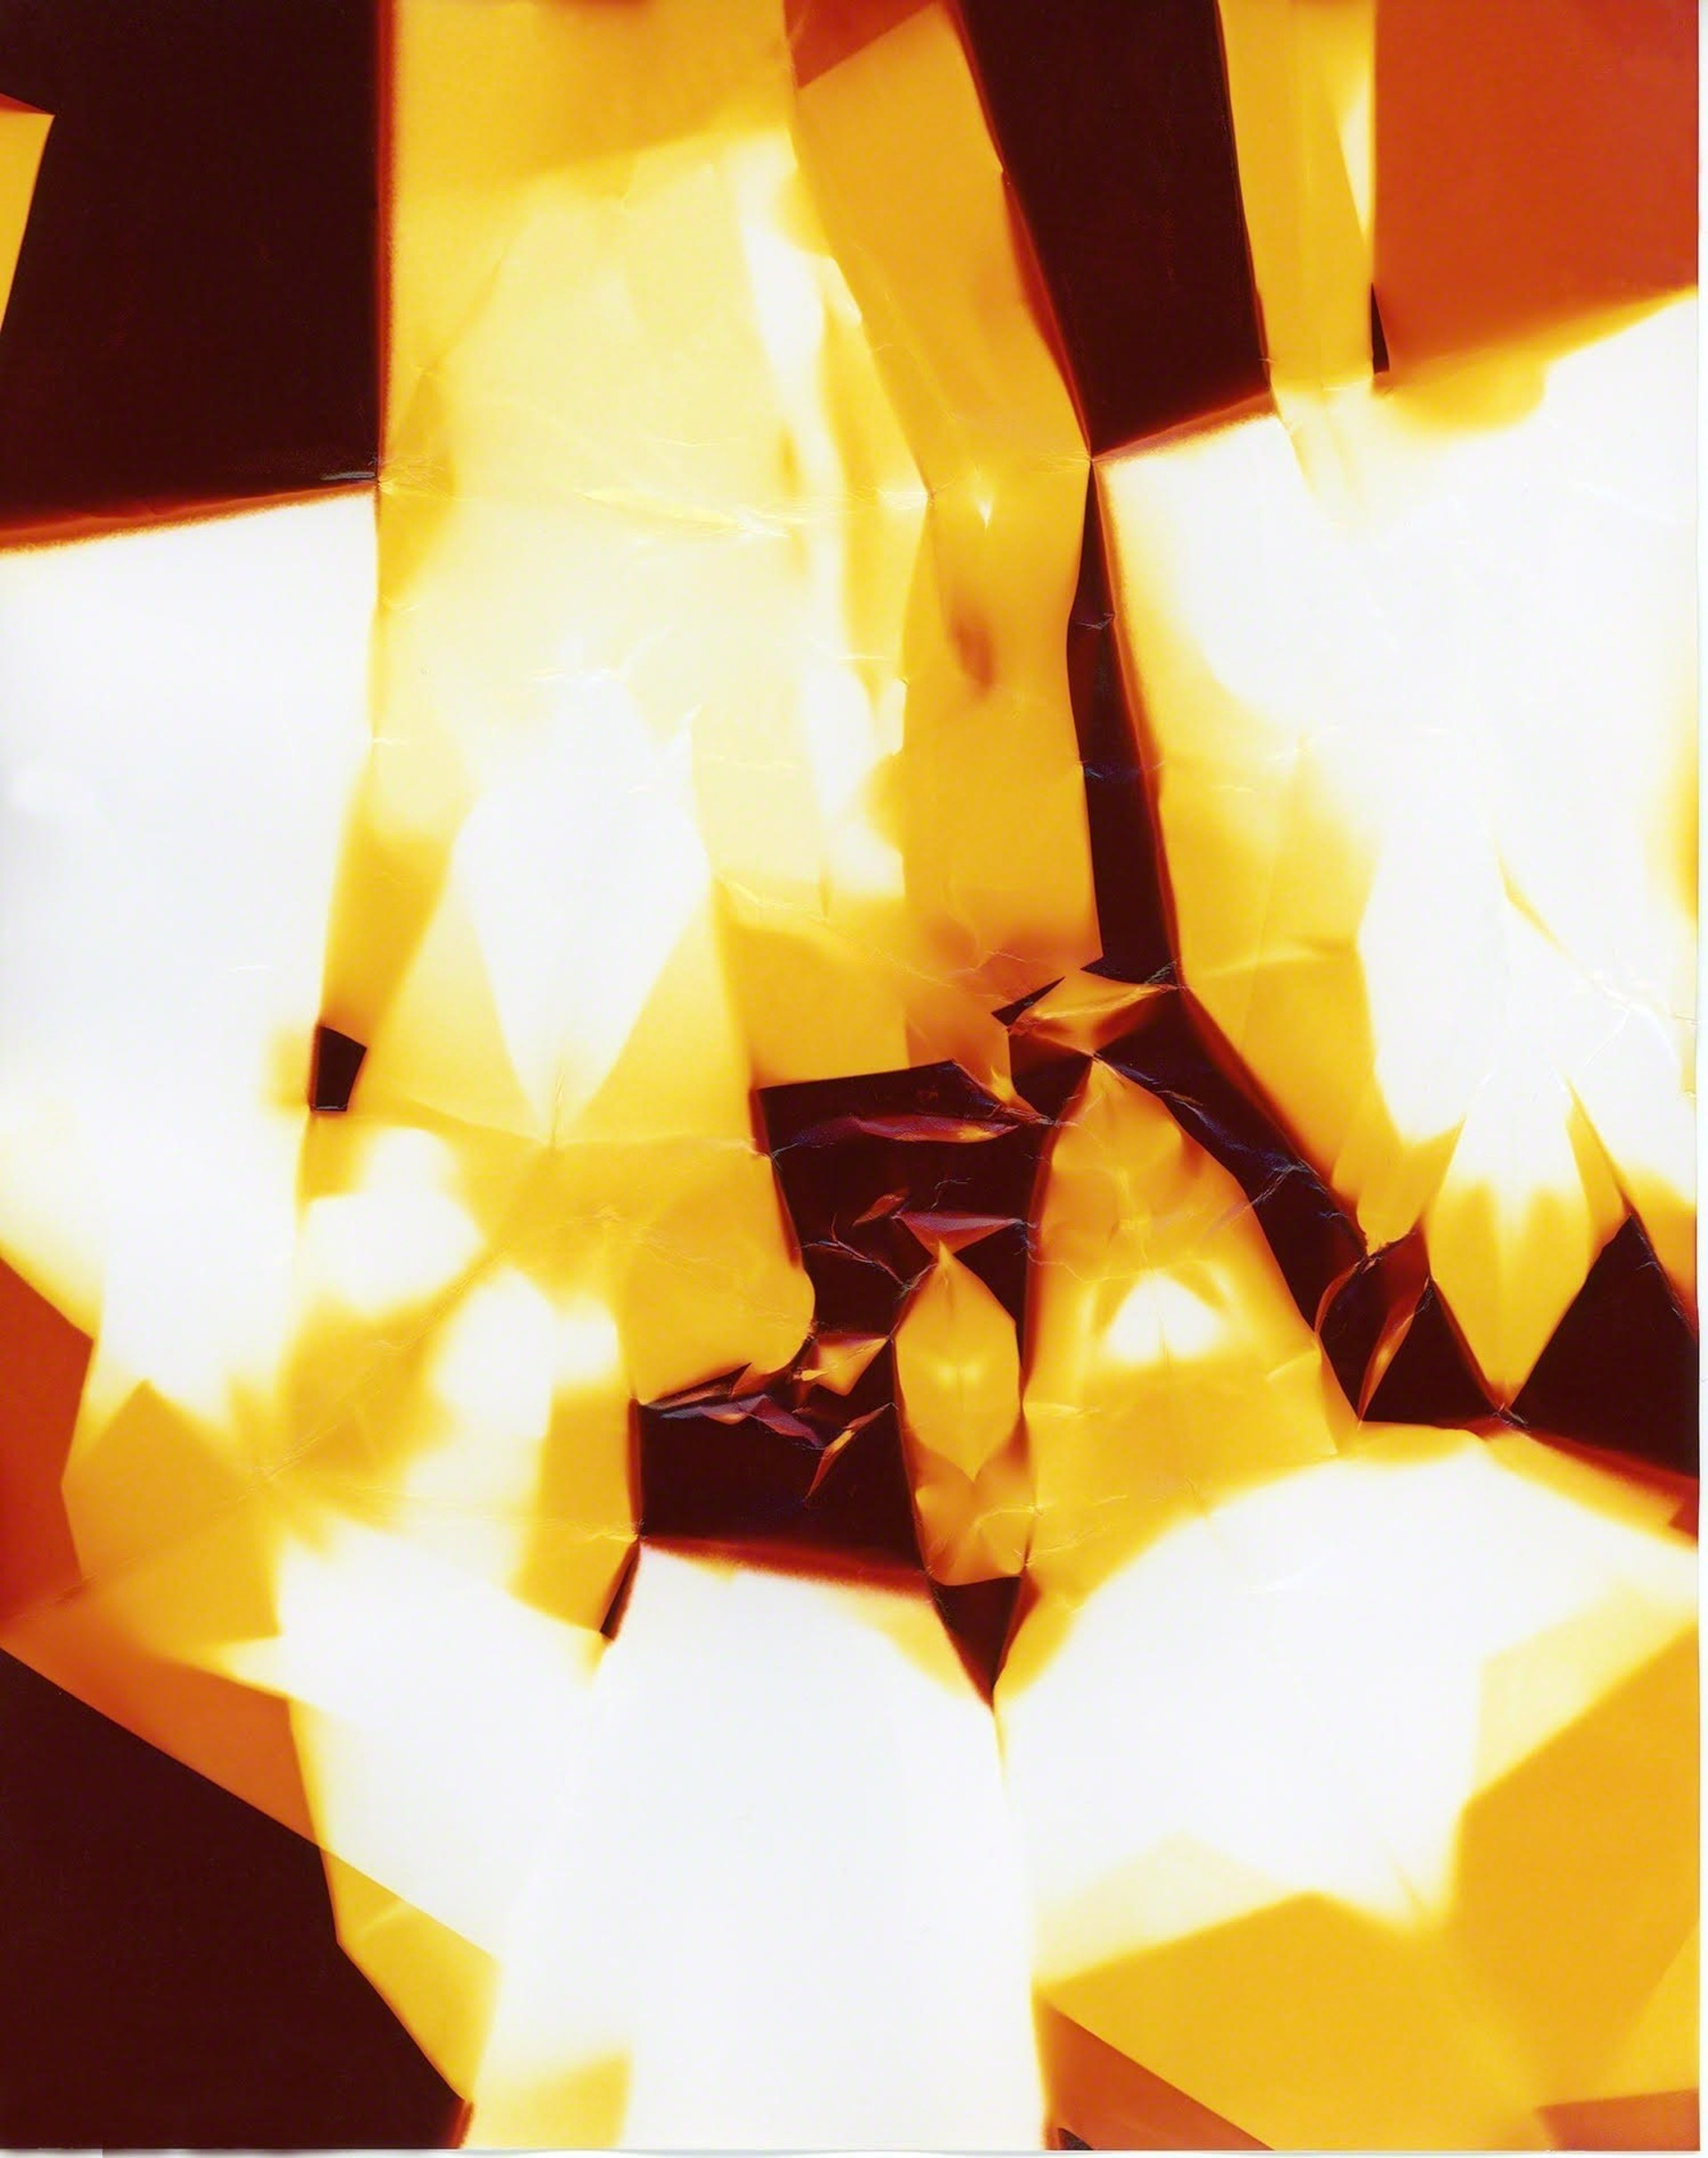 Bending Light 032 by Natalie Cheung